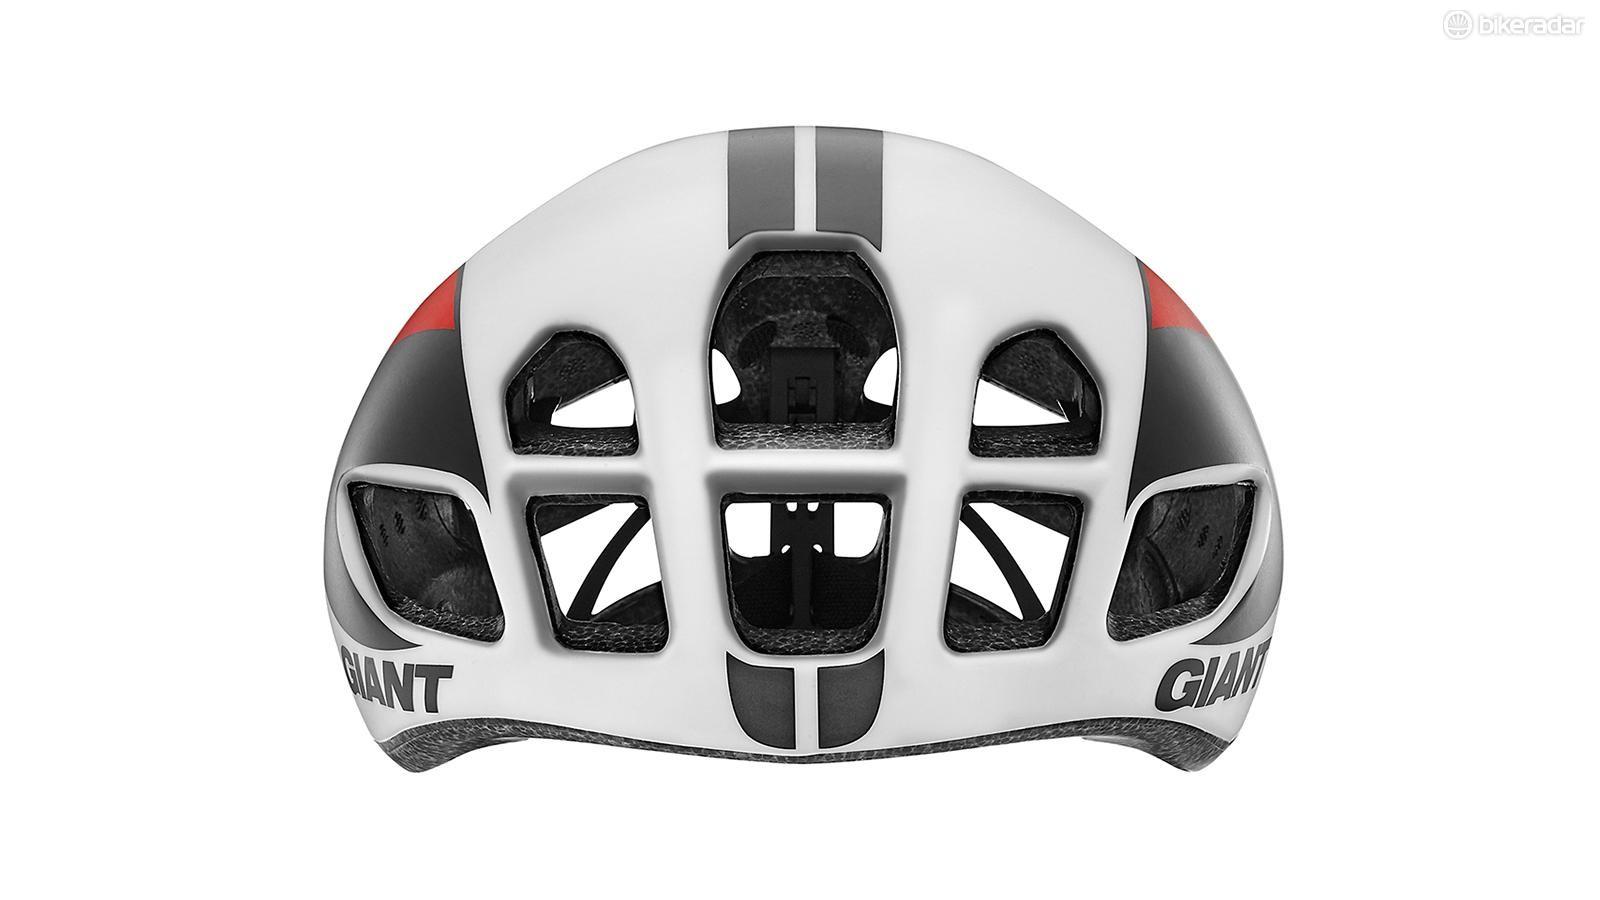 Giant's new Pursuit road helmet has huge intake vents up front